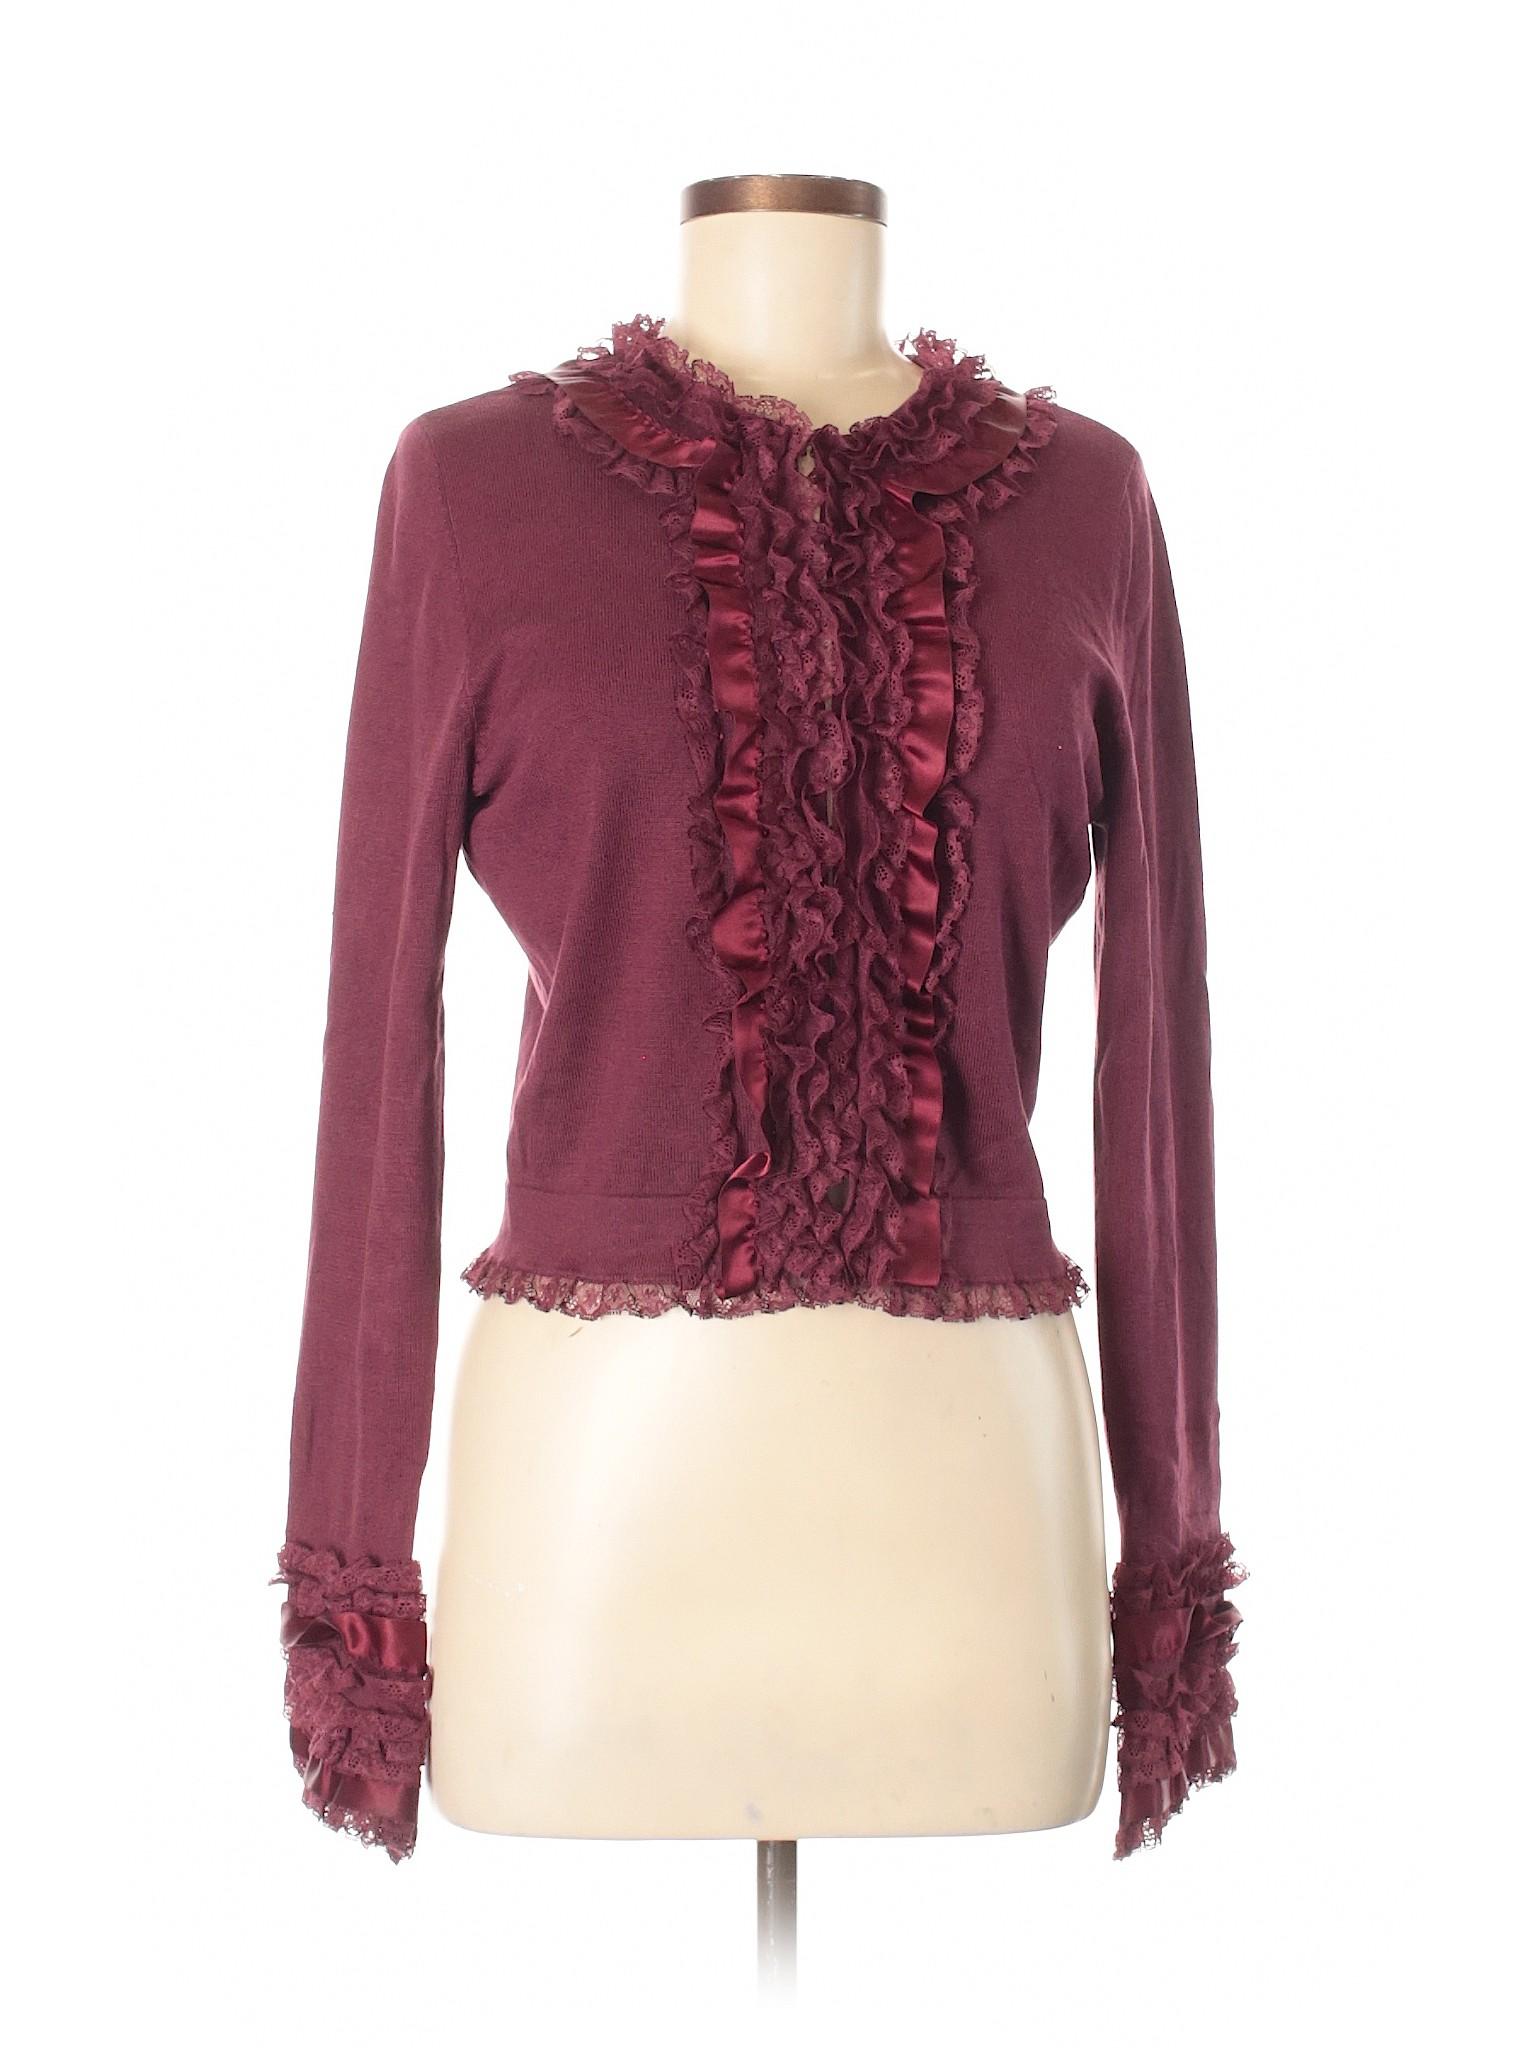 Silk International International Silk Moda Cardigan Boutique Moda Boutique OwHqa